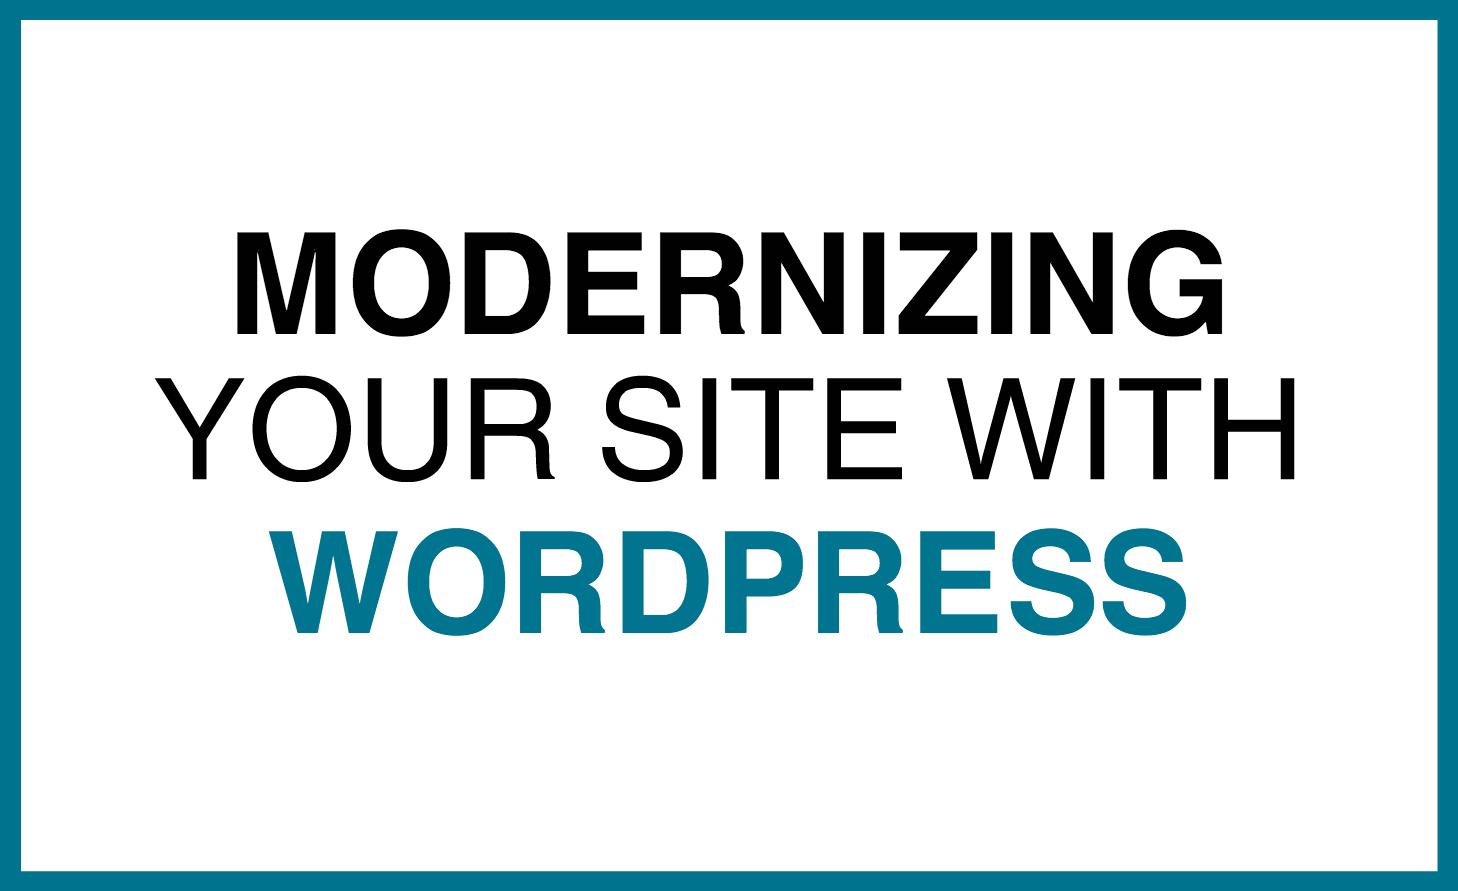 modernizing with wordpress.png